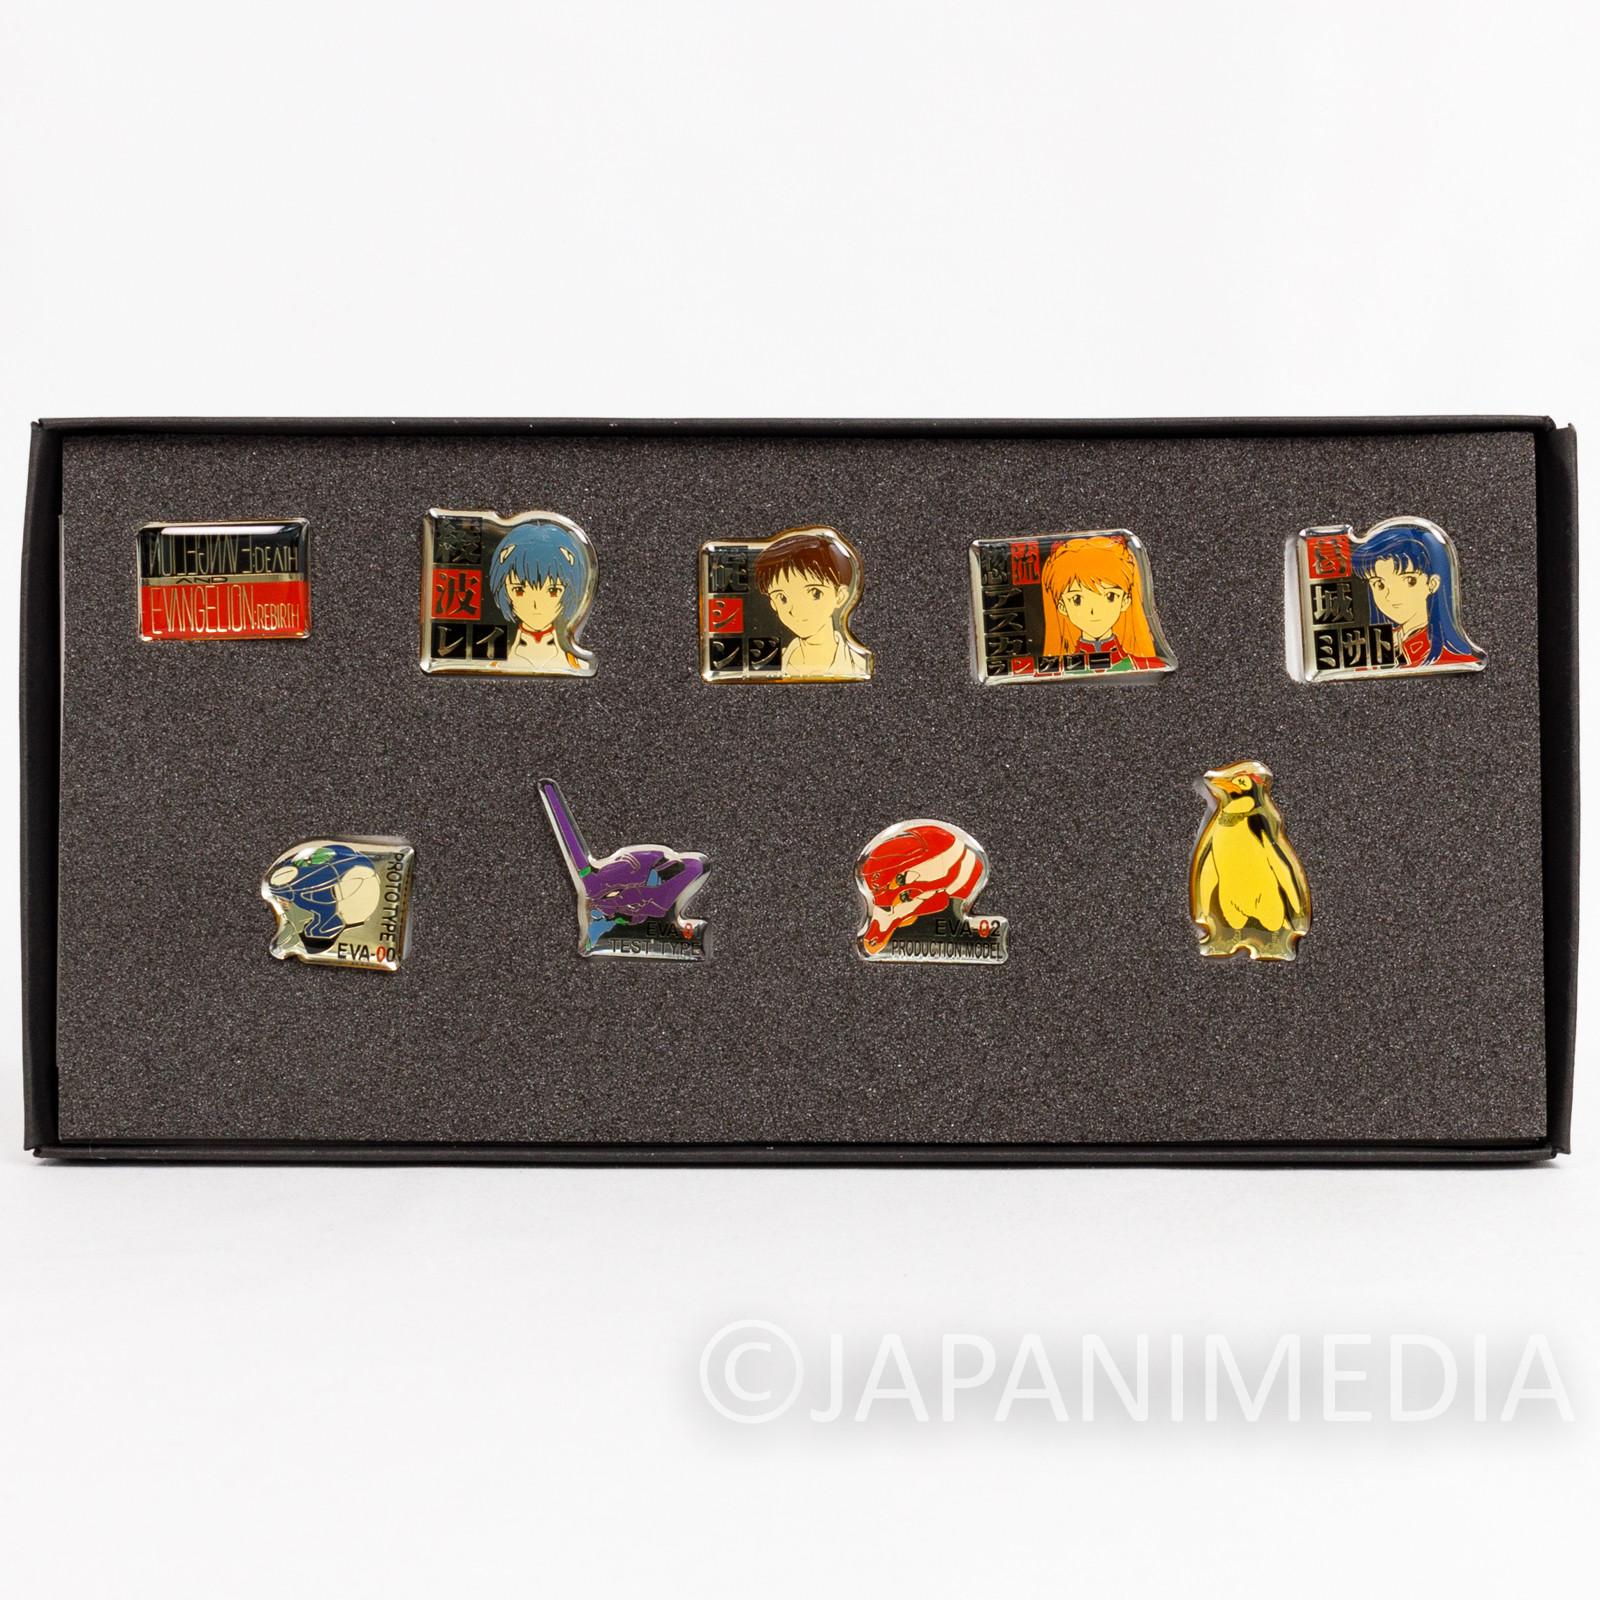 Evangelion Pins Collection Set NERV Shinji Asuka Ayanami Misato Penpen